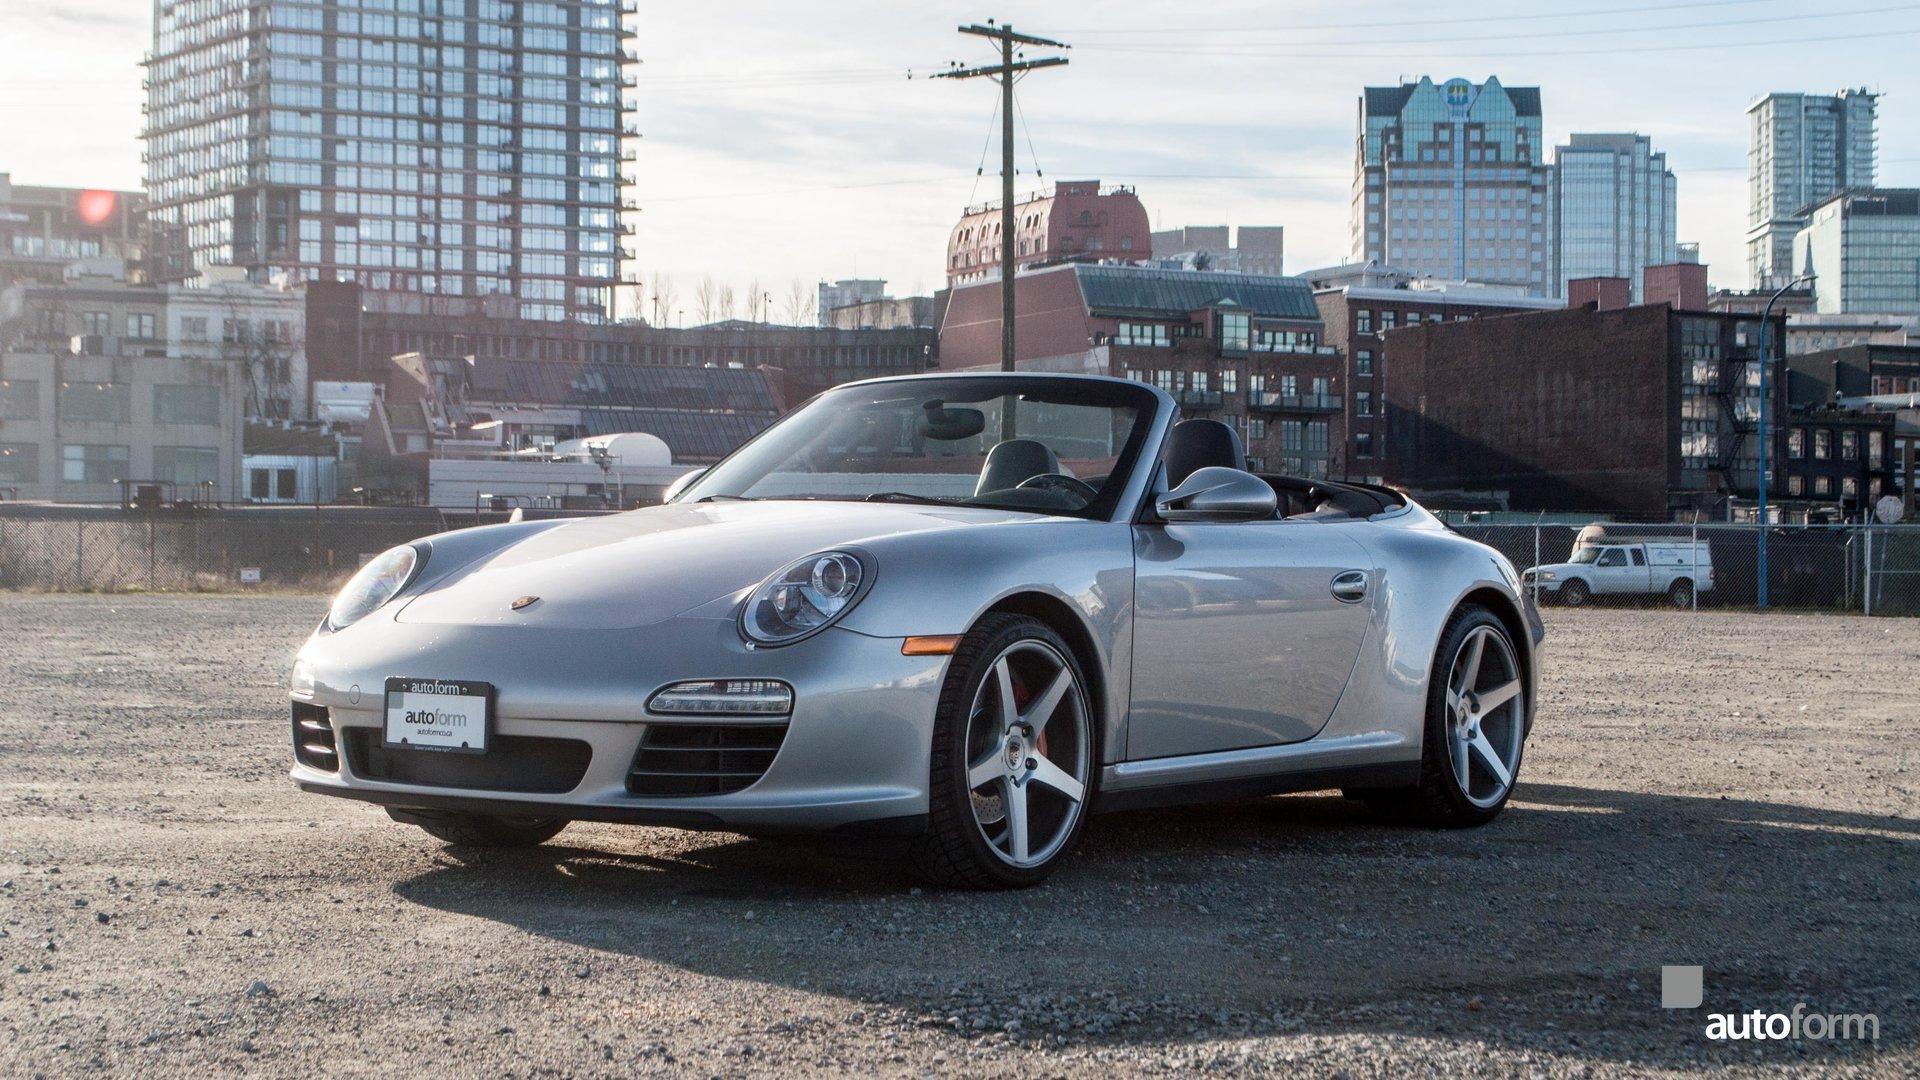 2011 porsche 911 carrera 4s autoform. Black Bedroom Furniture Sets. Home Design Ideas